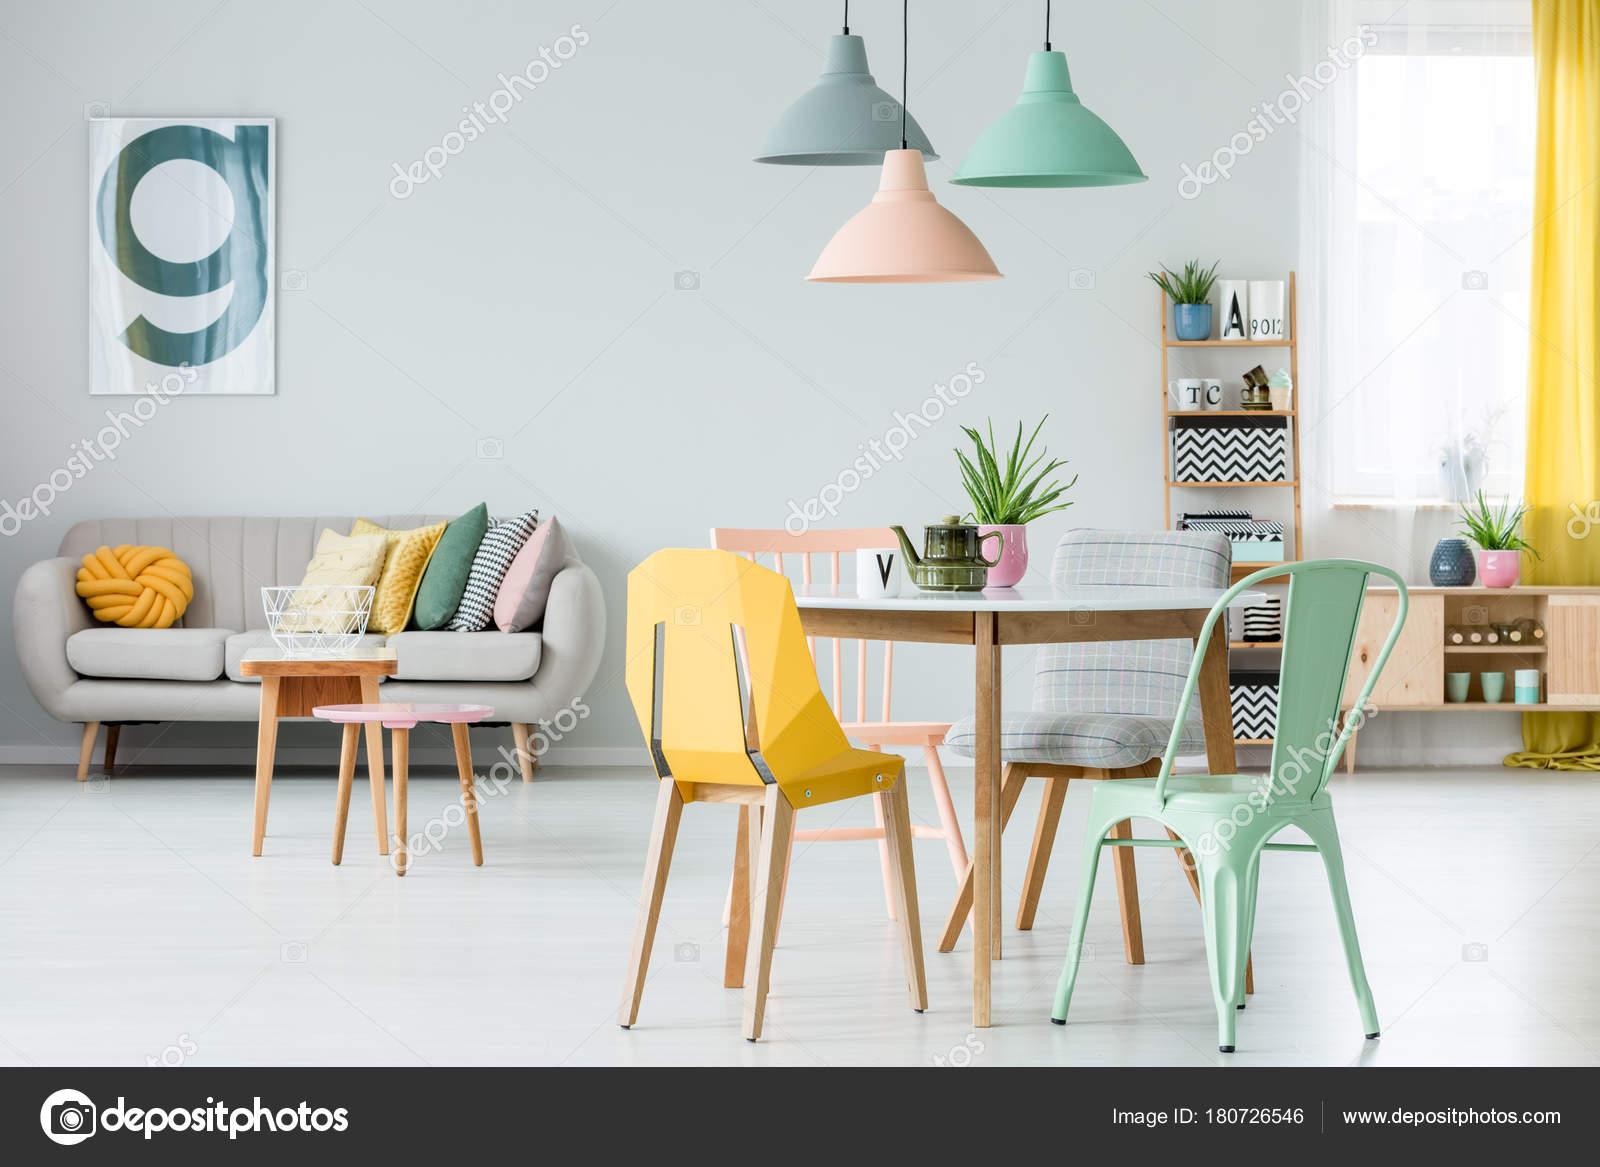 Kleurrijke Interieurs Pastel : Moderne kleurrijke woonkamer u2014 stockfoto © photographee.eu #180726546